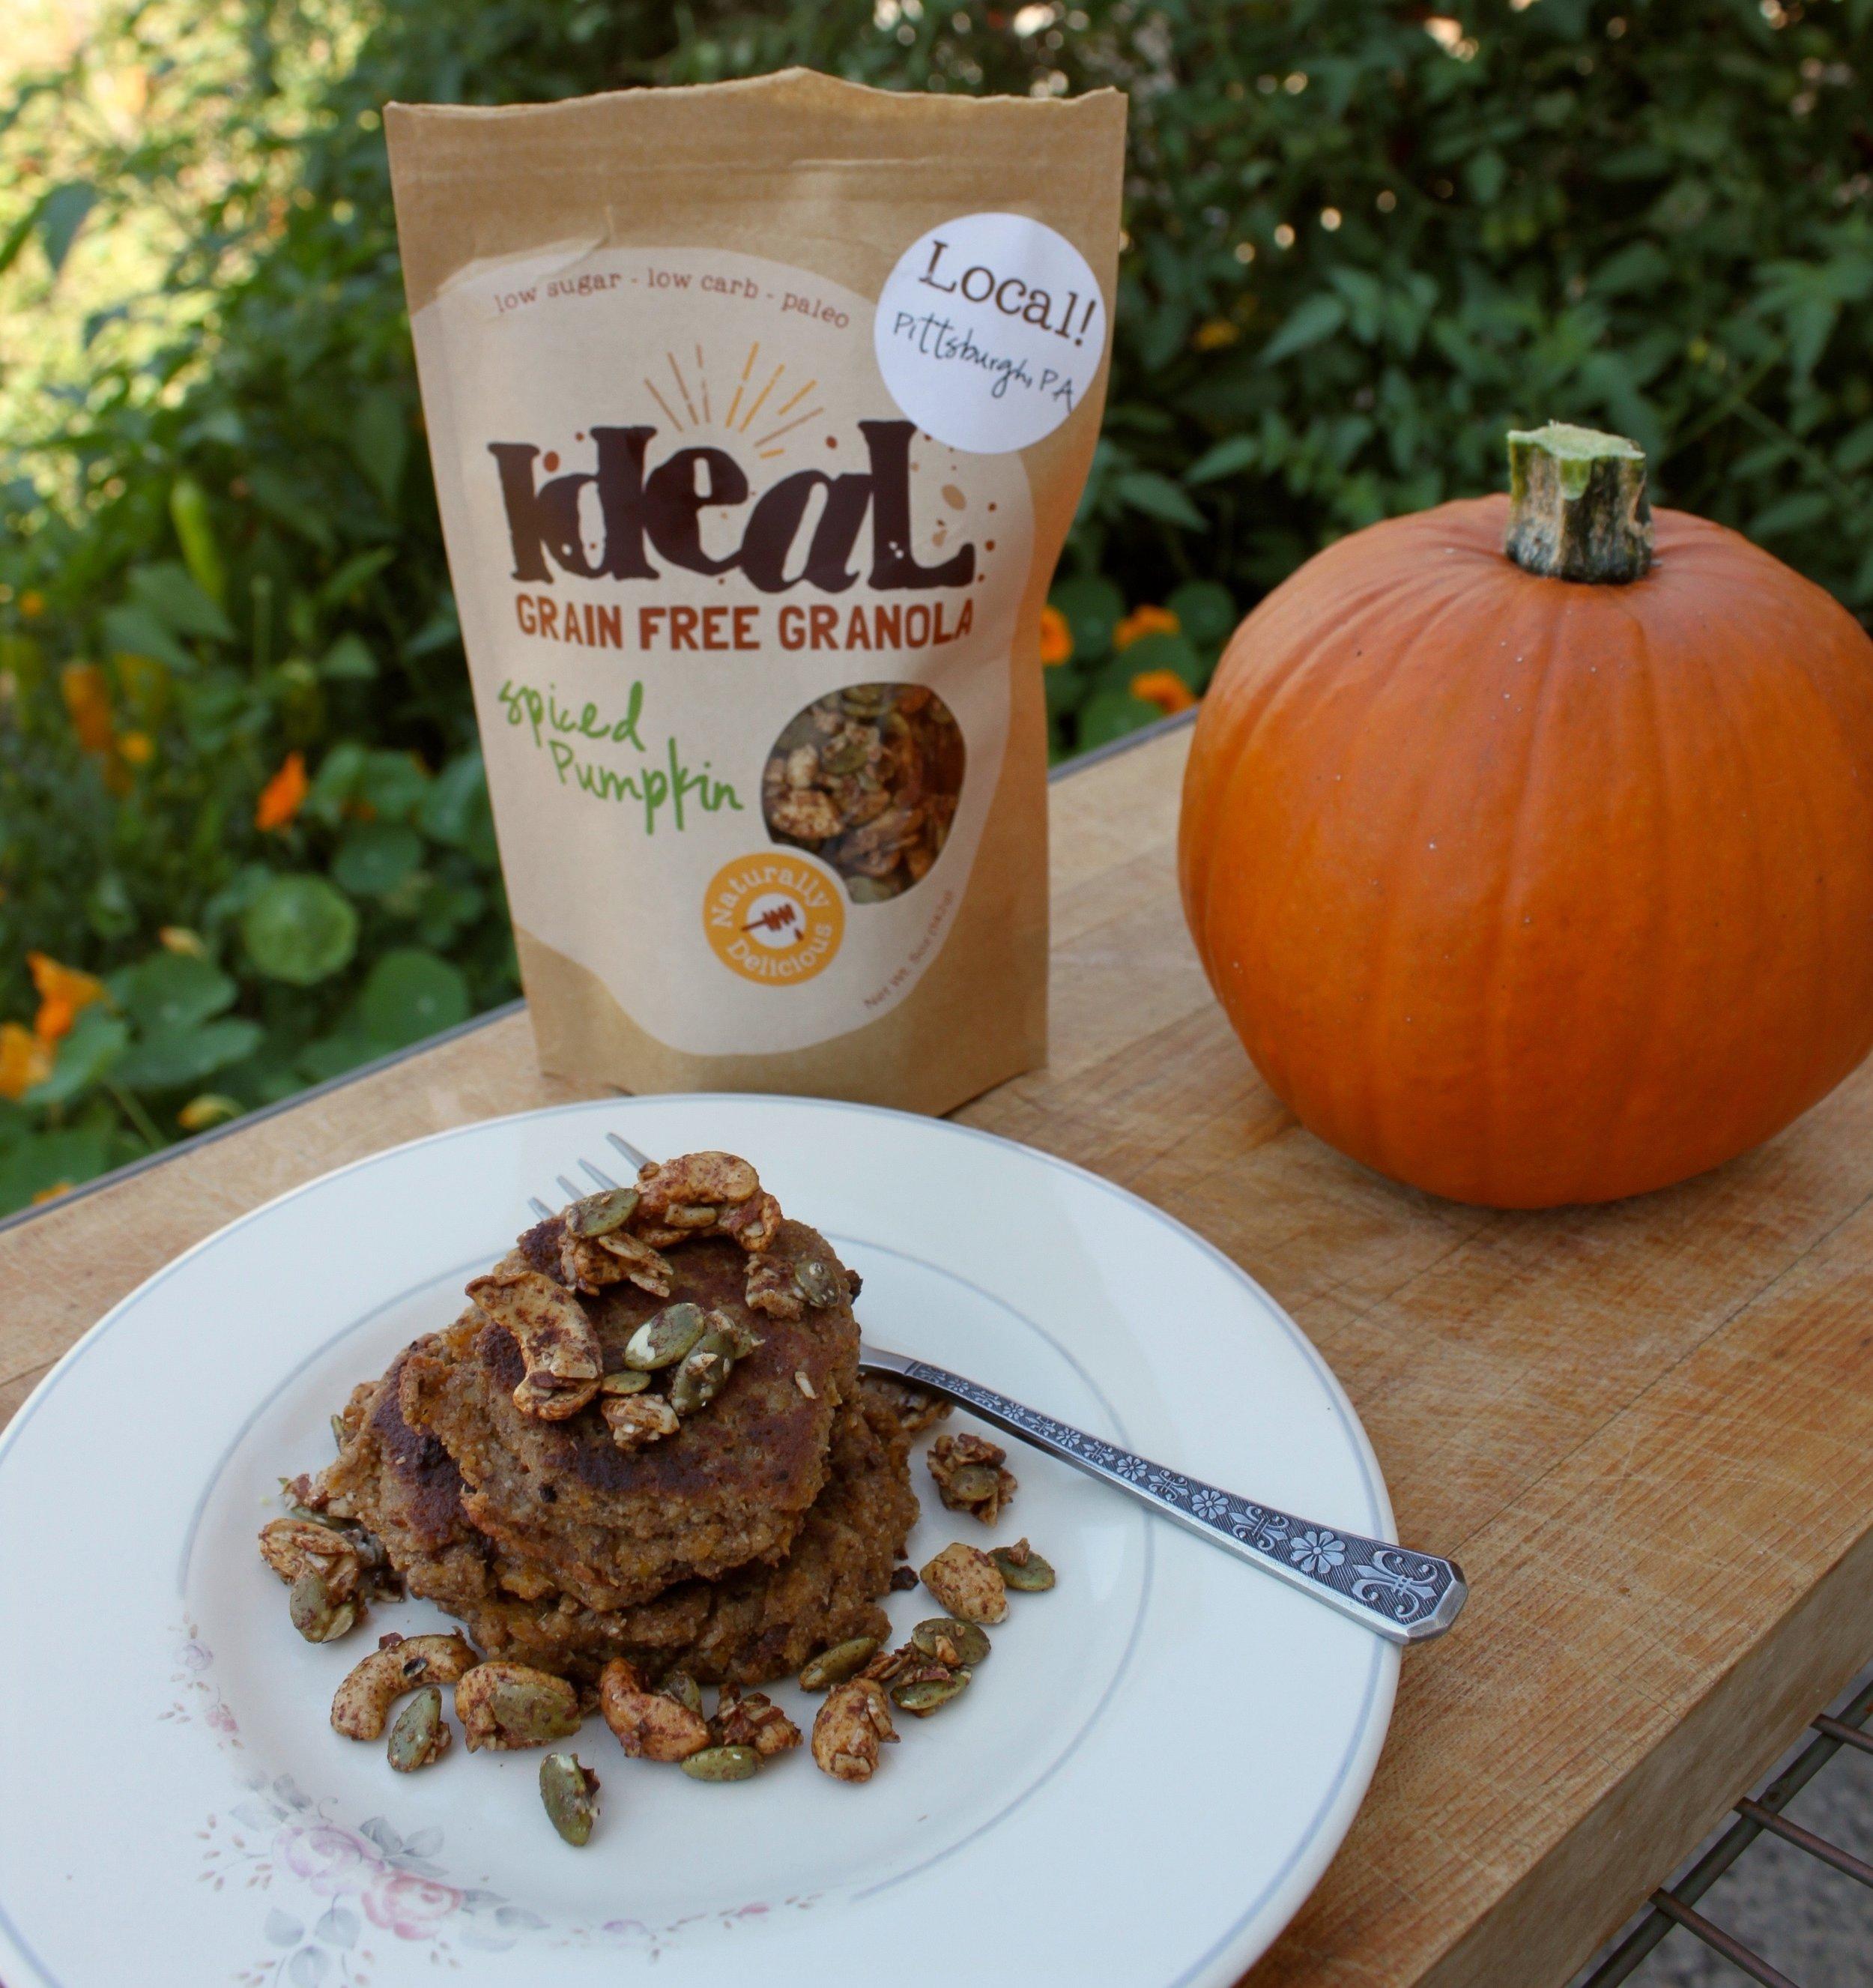 Coconut Flour Pumpkin Pancakes with Ideal Grain Free Granola